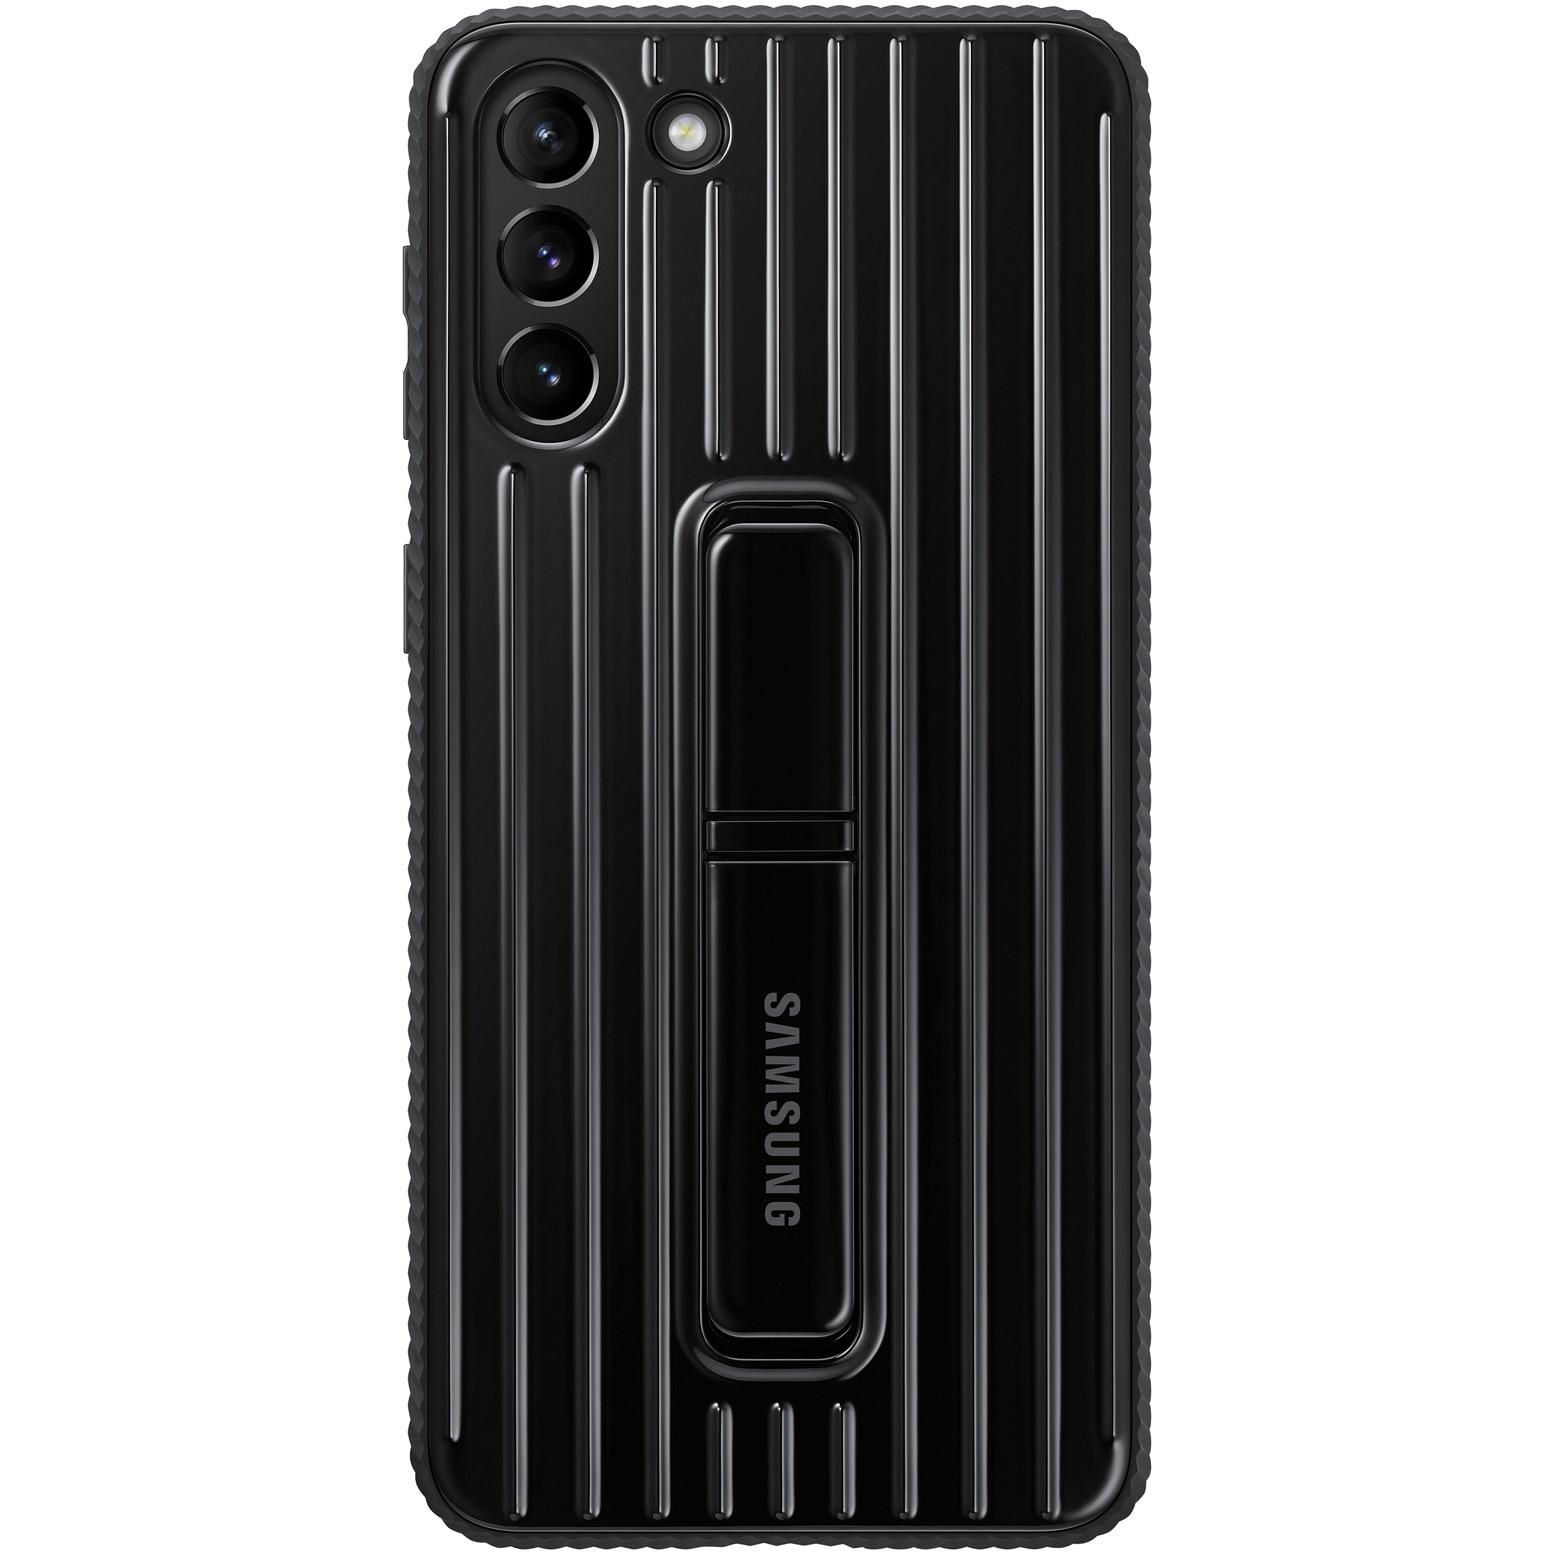 Fotografie Husa de protectie Samsung Protective Standing Cover pentru Galaxy S21 Plus, Black